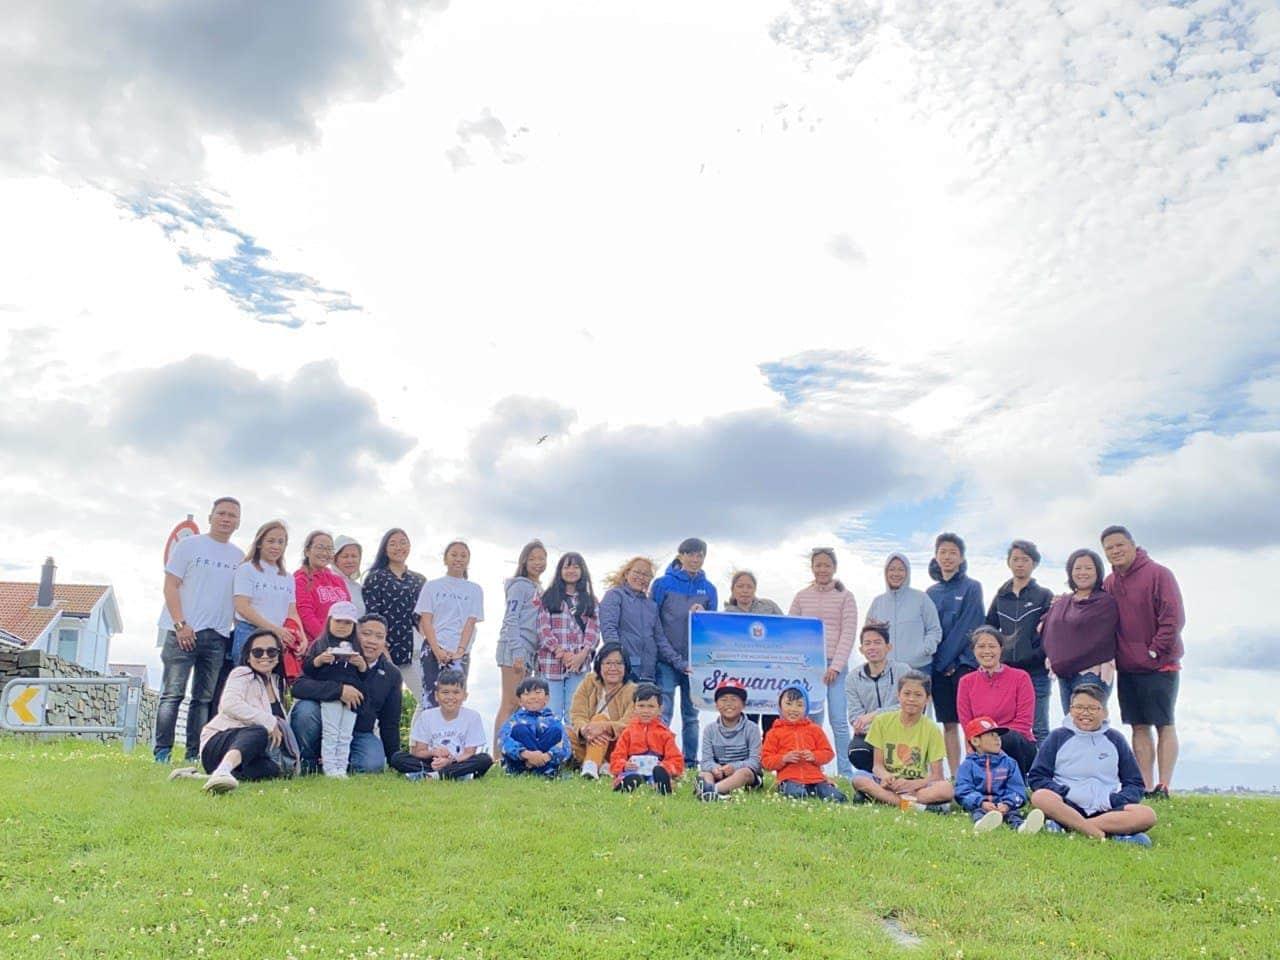 Stavanger GWS holds anniversary get-together